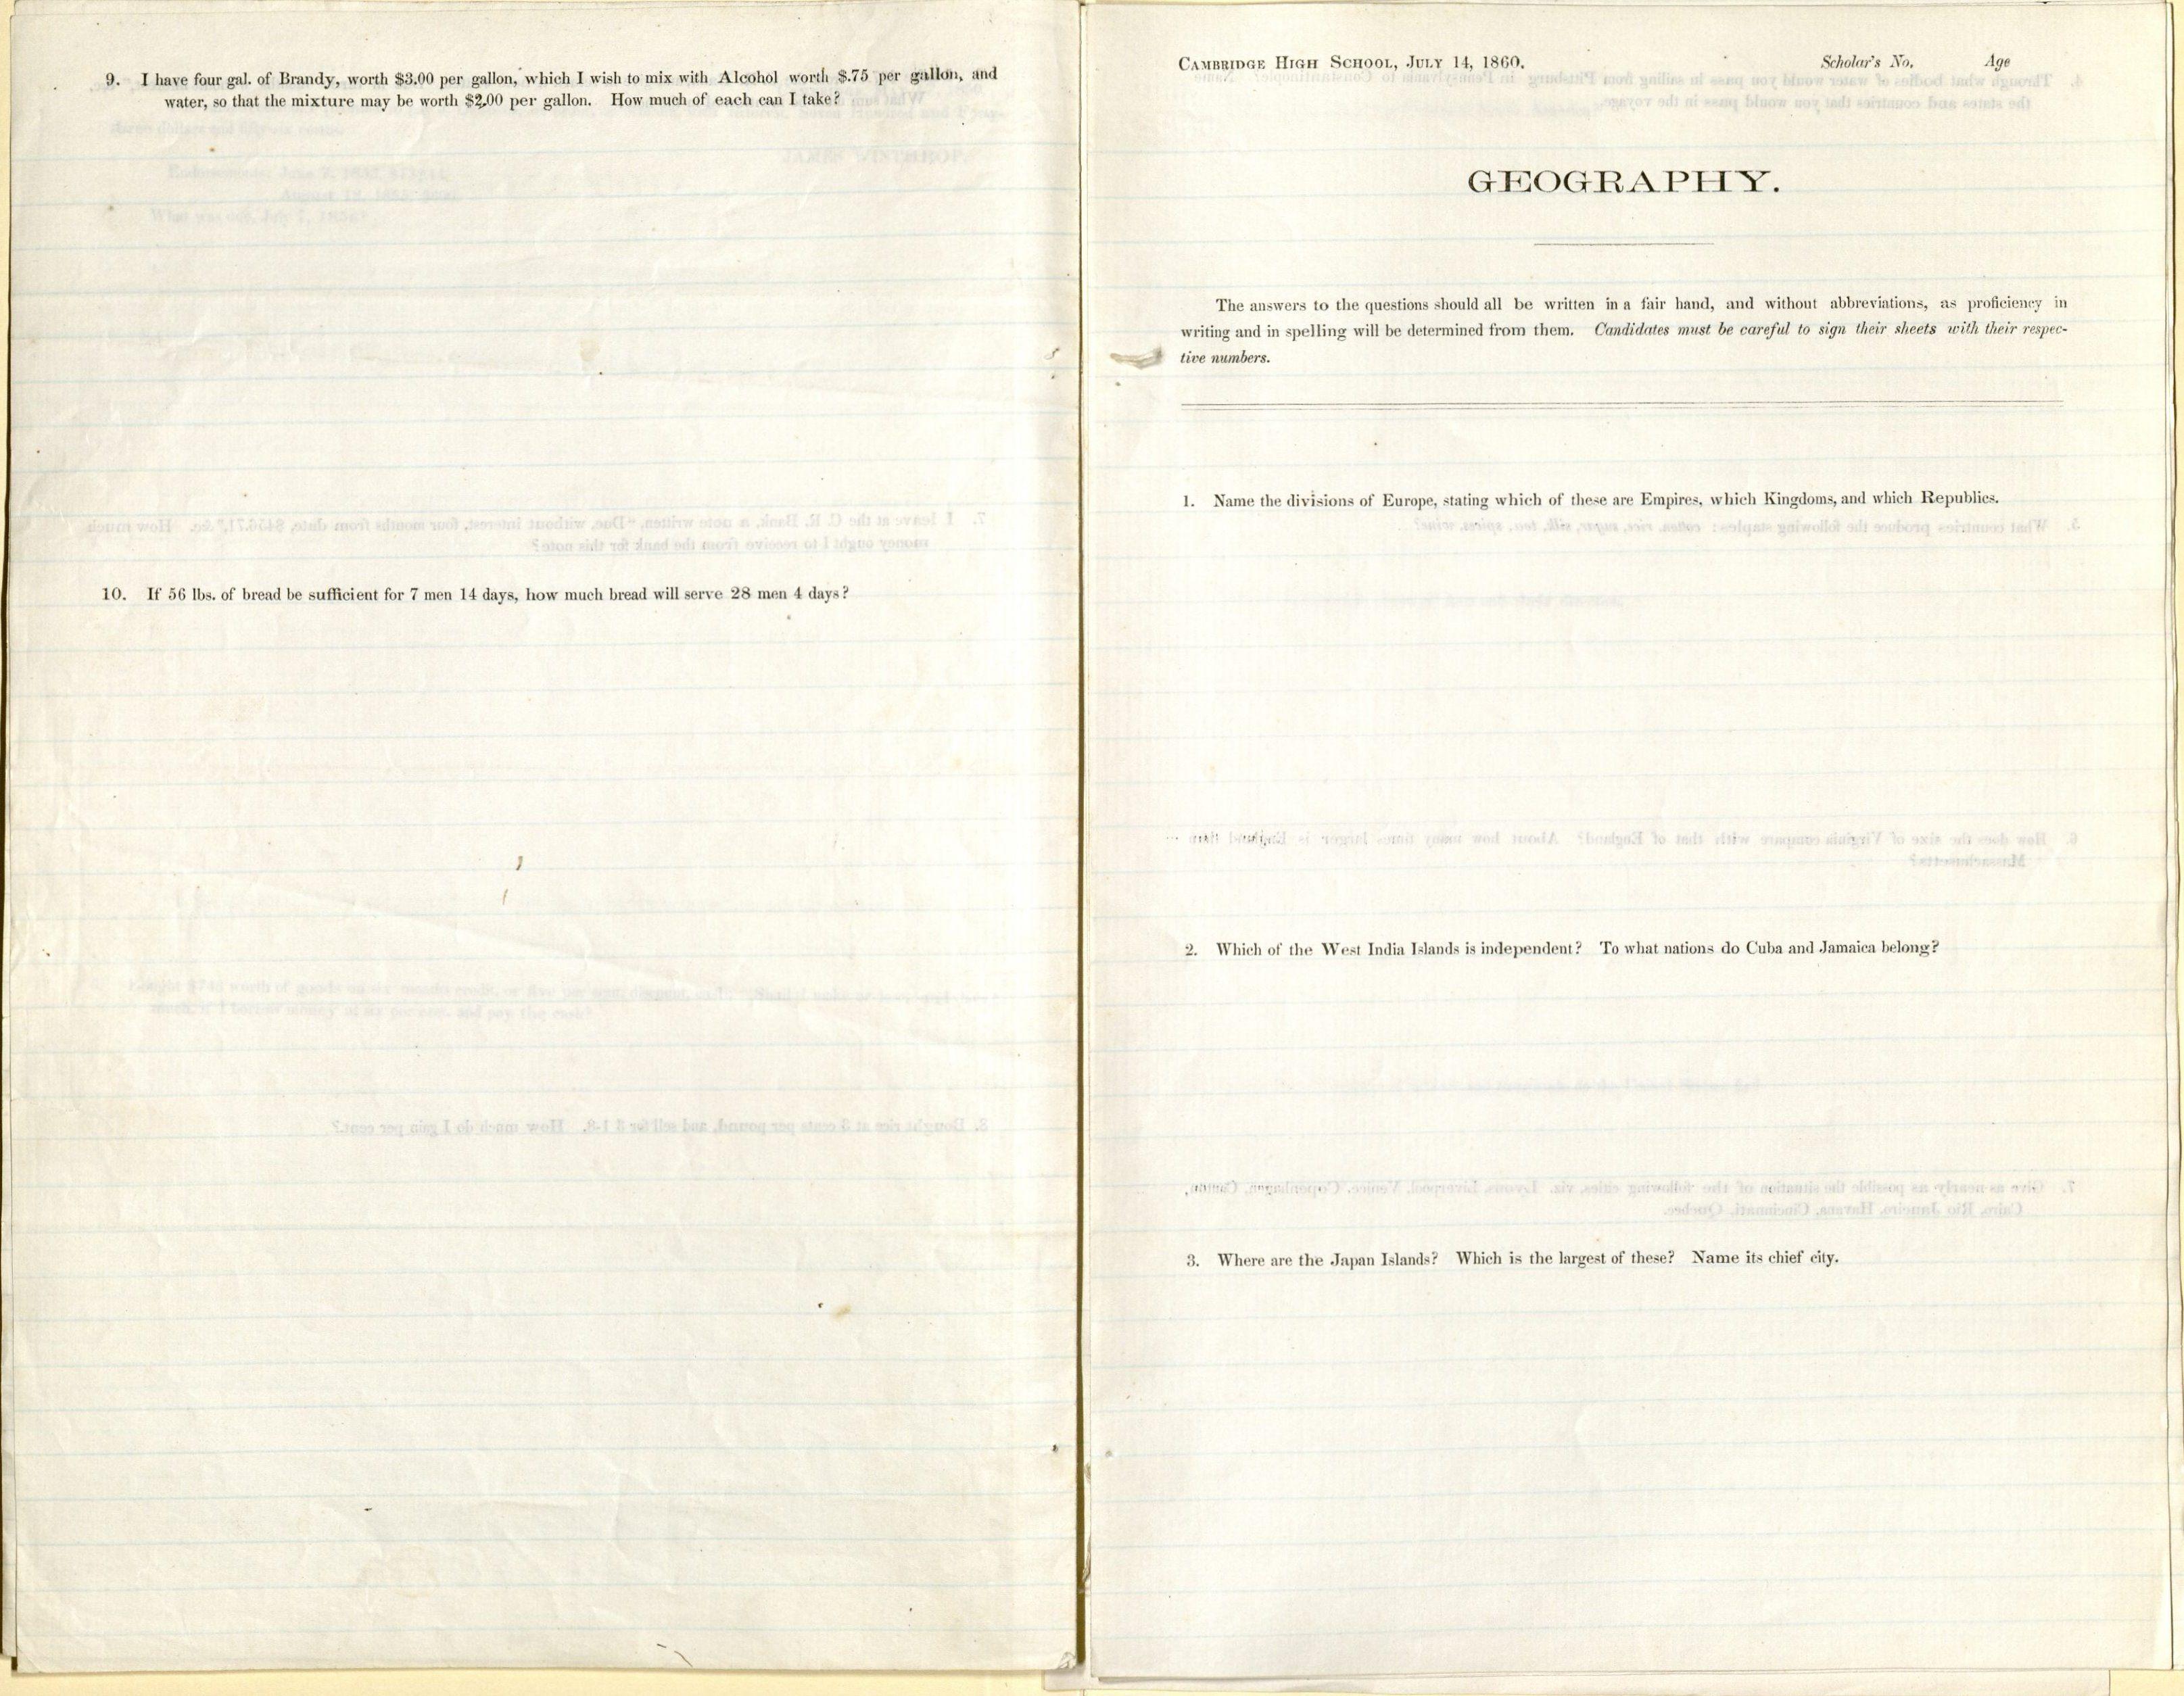 Cambridge High School examination, 1860. MS Am 2941 (15)